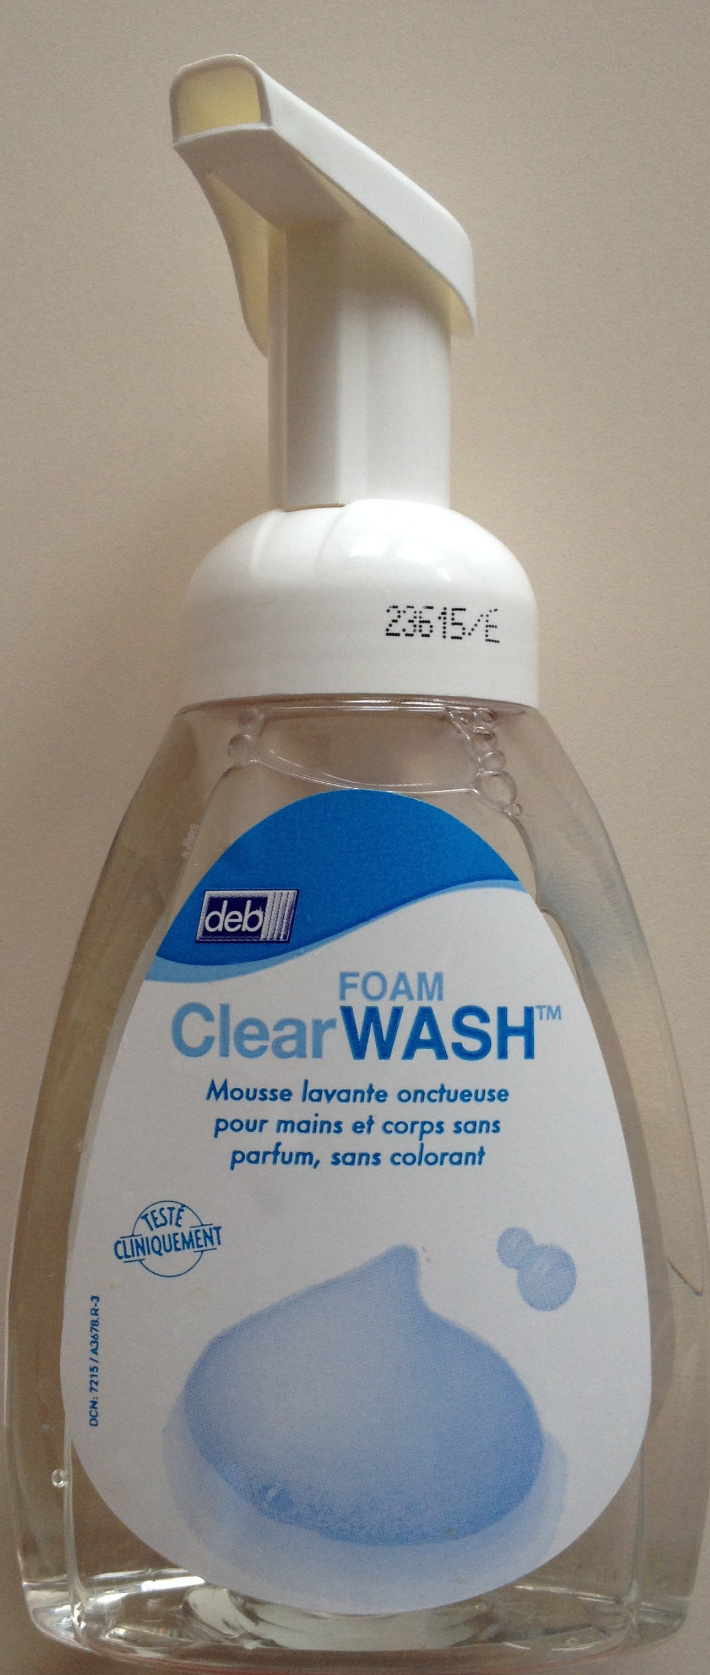 Foam Clear Wash - Product